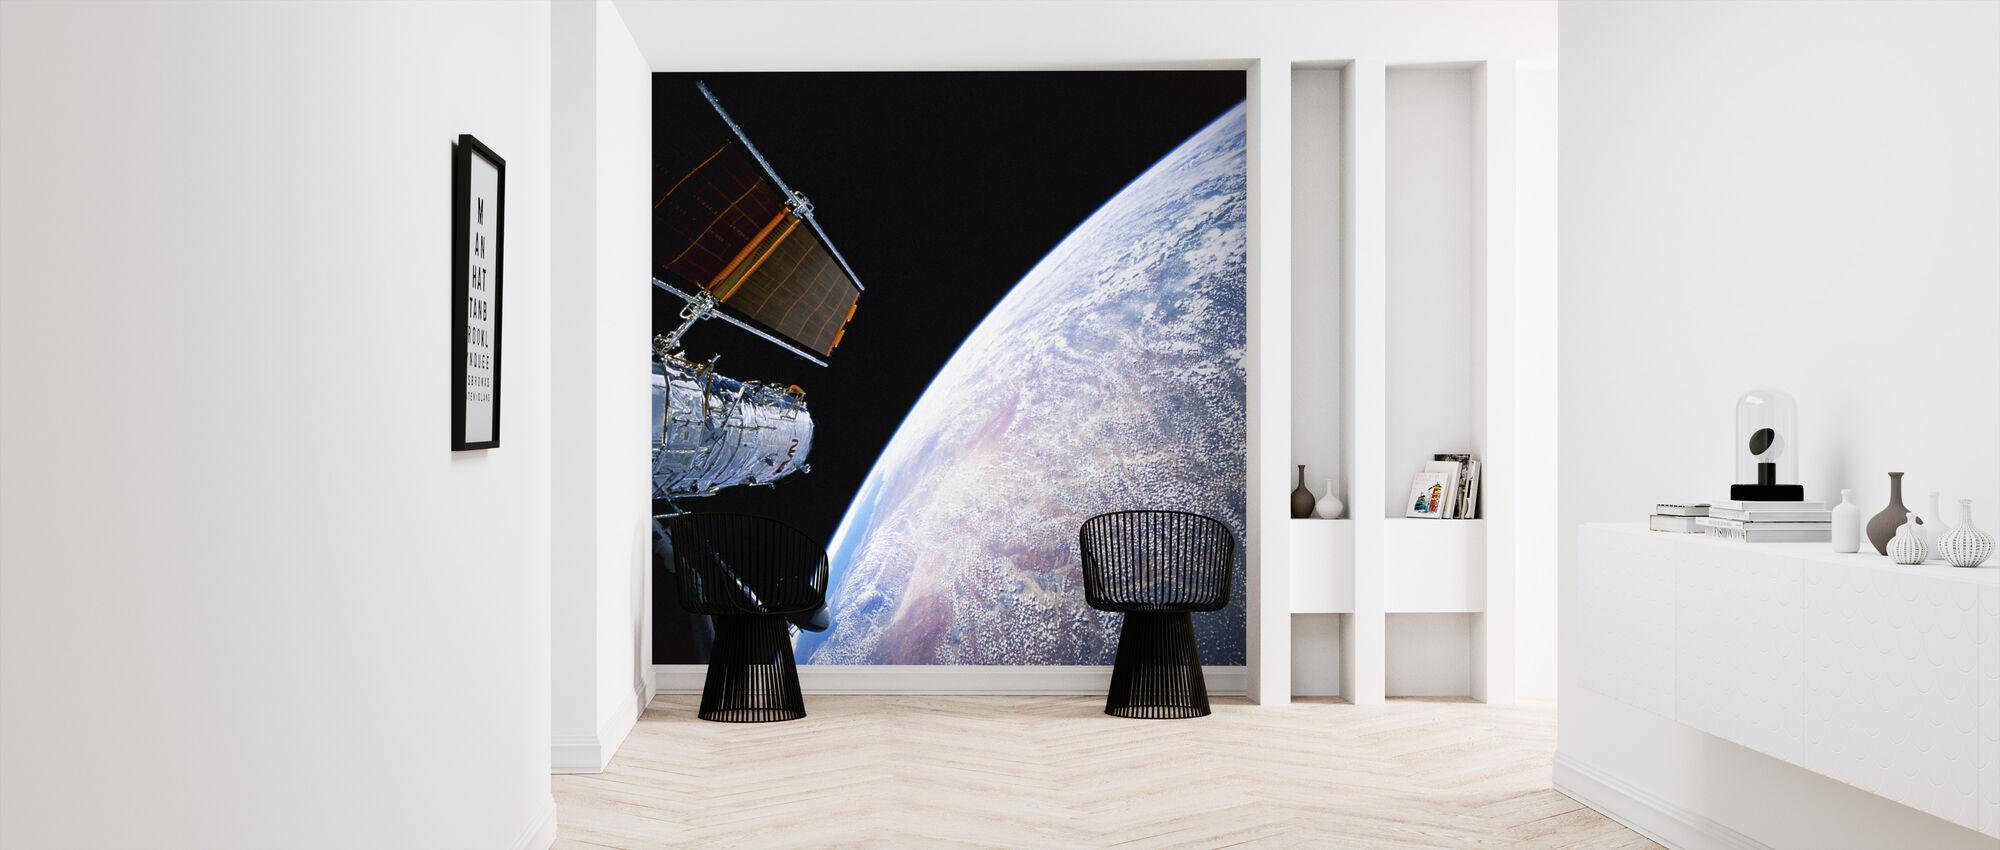 Hubble Space Telescope - Wallpaper - Hallway